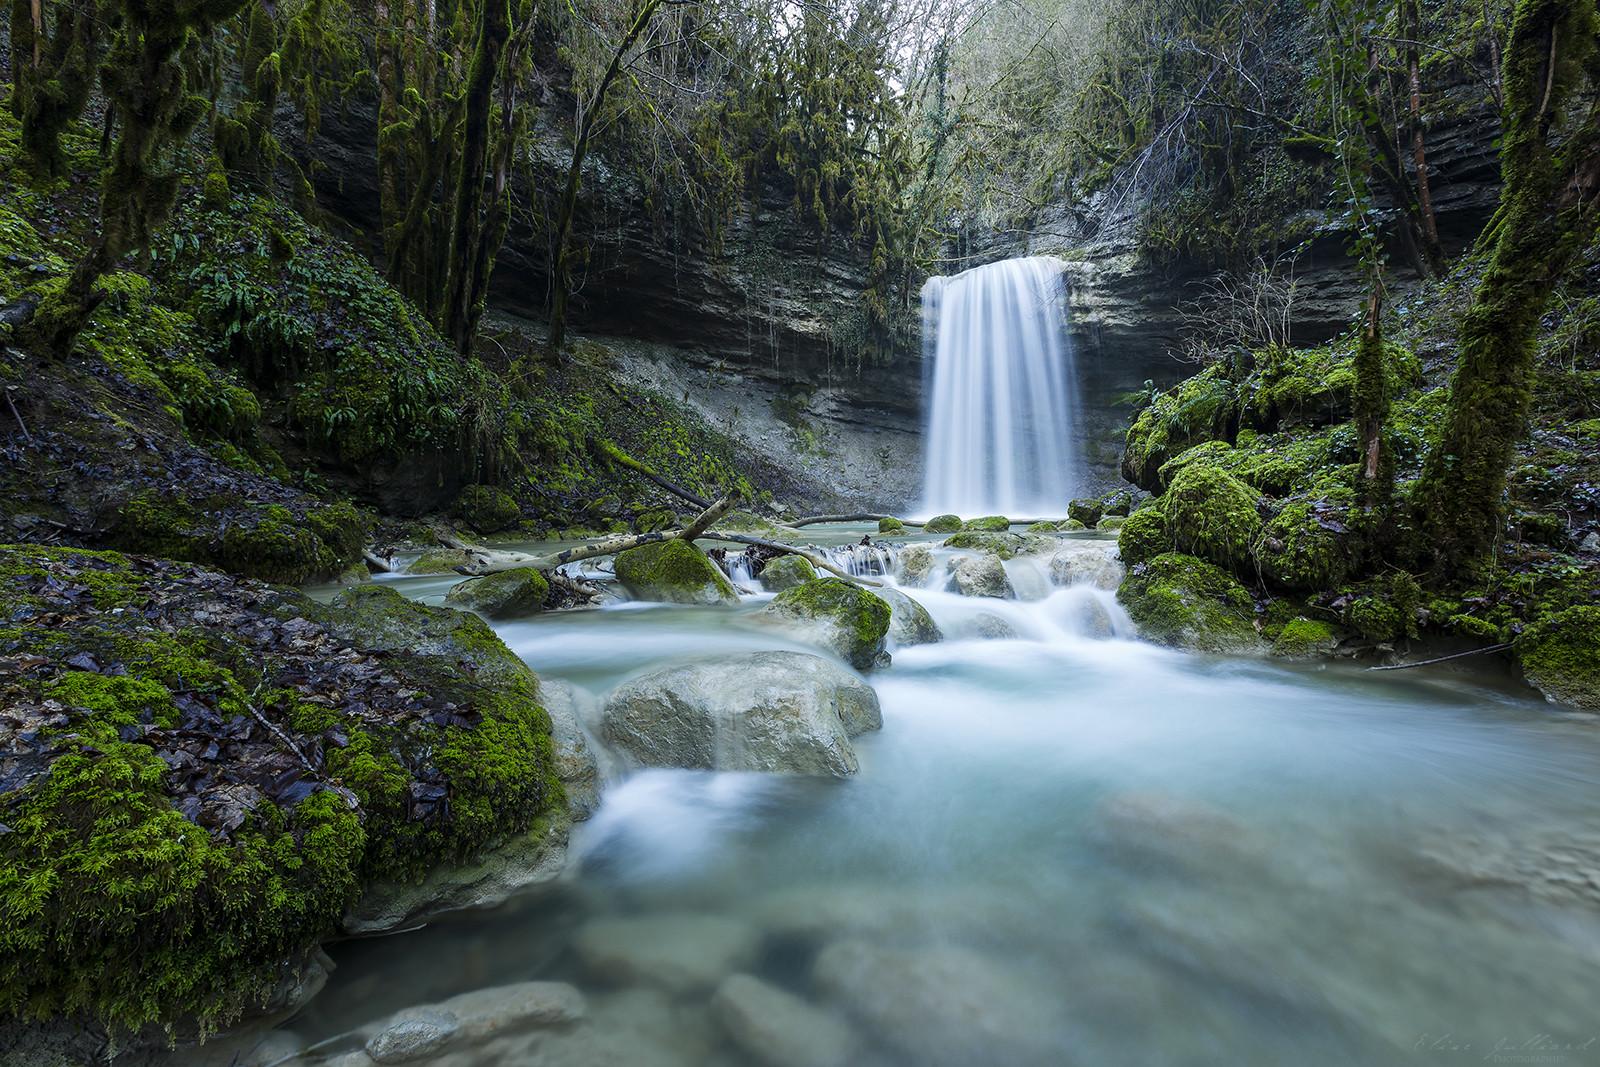 elise-julliard-photographe-rhone-alpes-ain-bugey-foret-mousse-riviere-photo-cascade